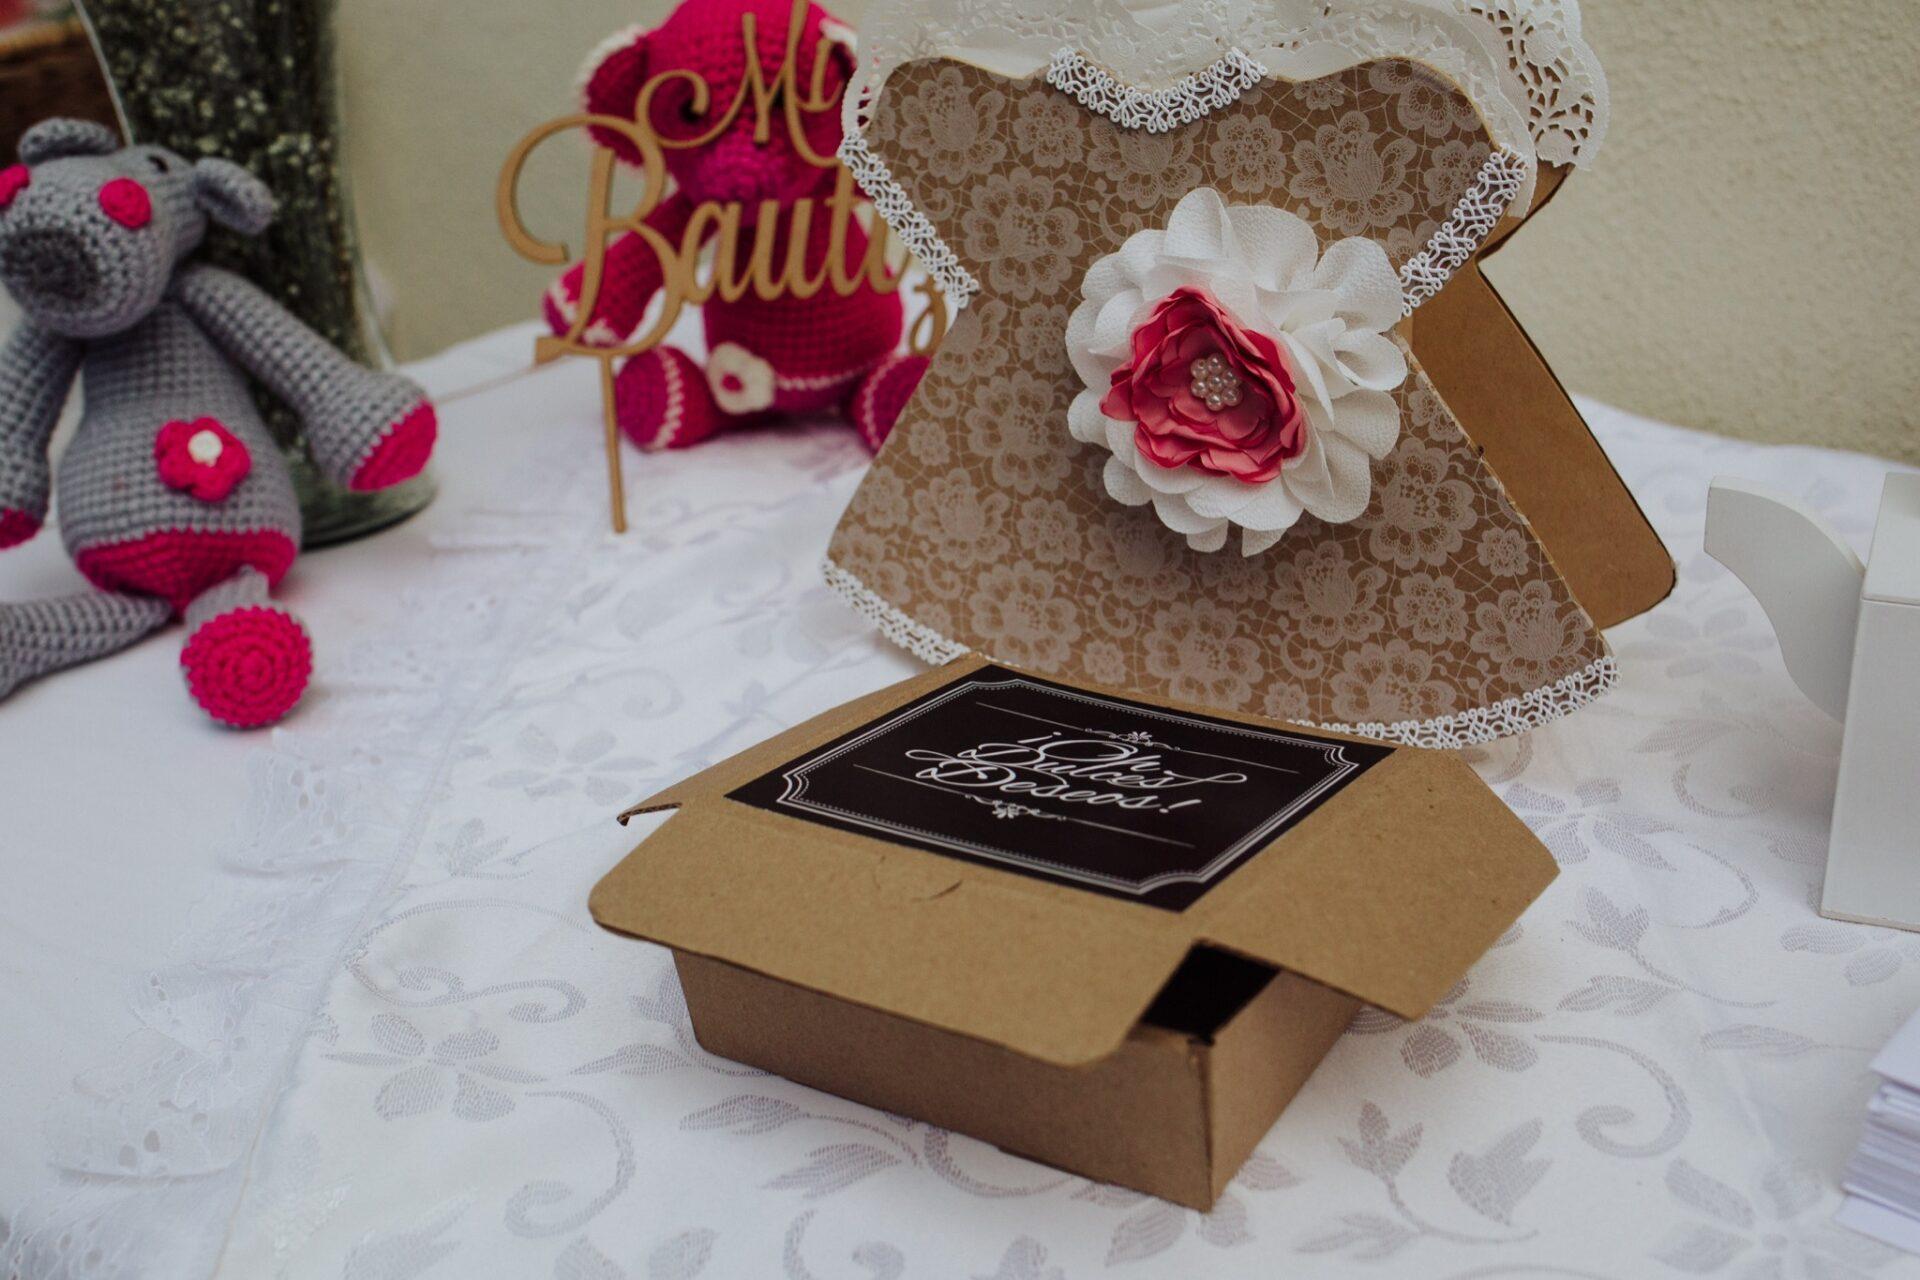 javier_noriega_fotografo_bodas_centro_platero_zacatecas_wedding_photographer30